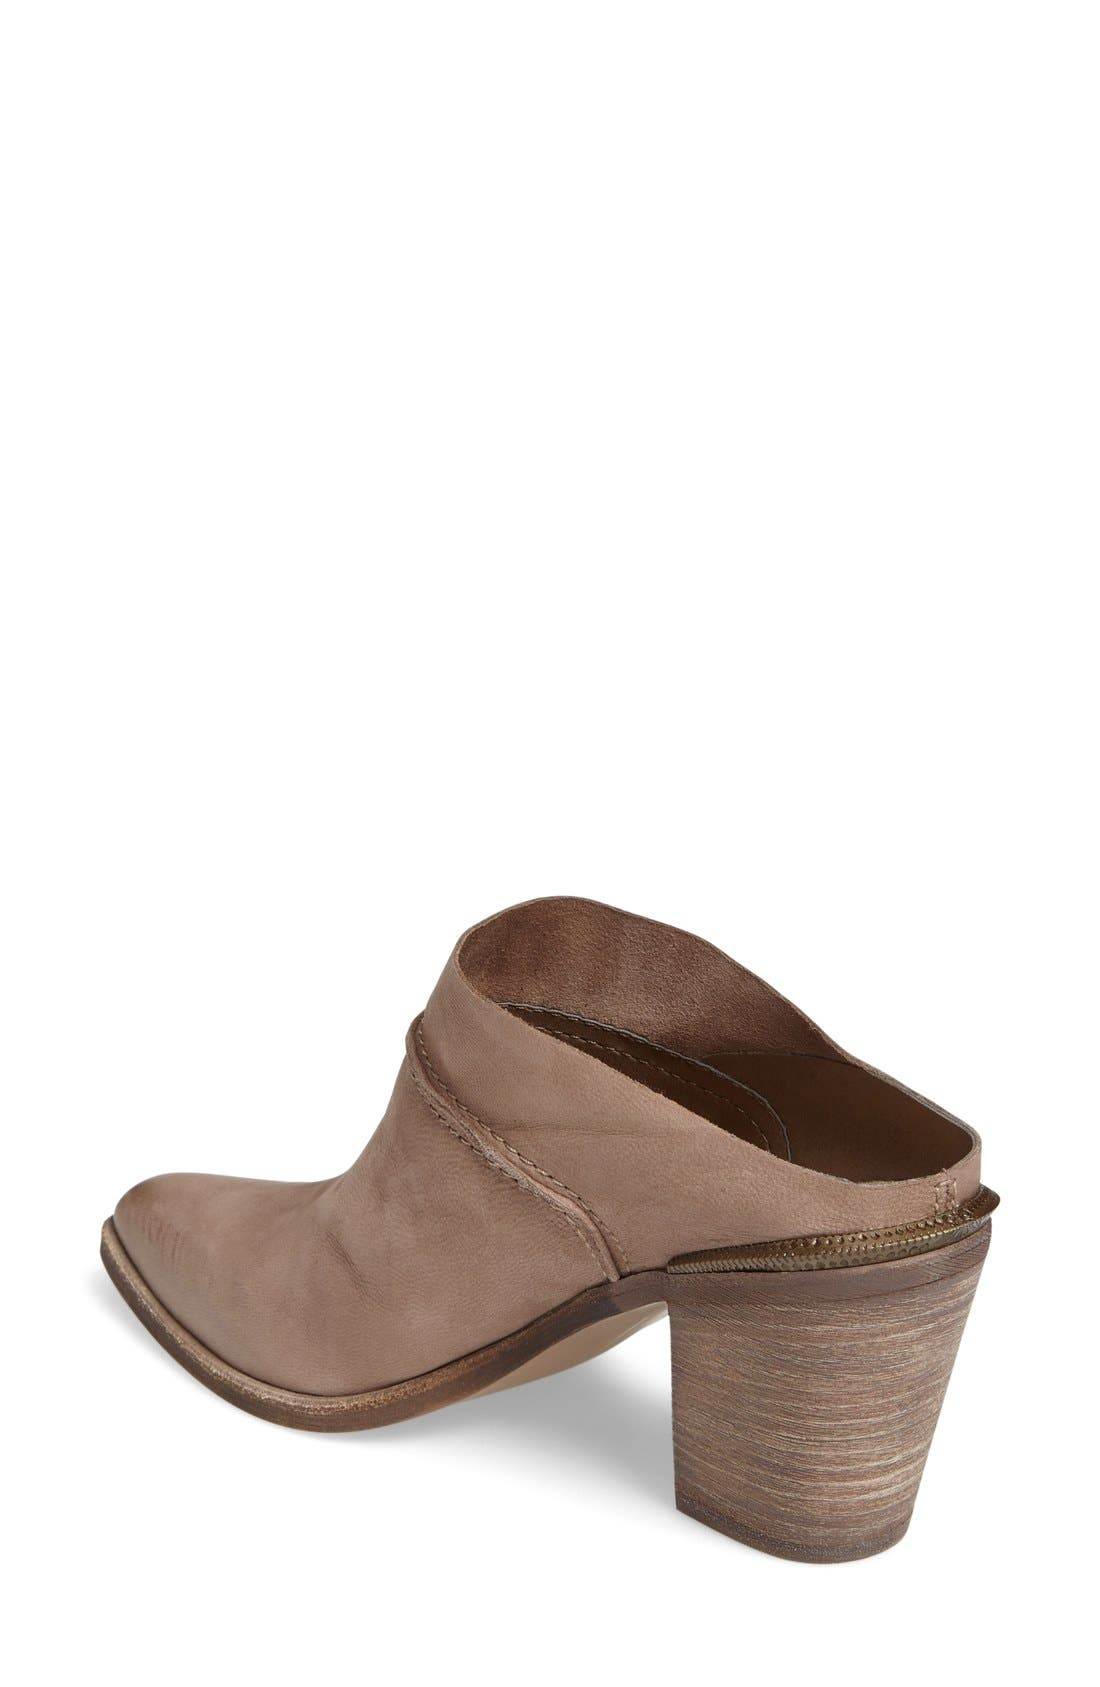 Alternate Image 2  - Dolce Vita Wes Block Heel Mule (Women)